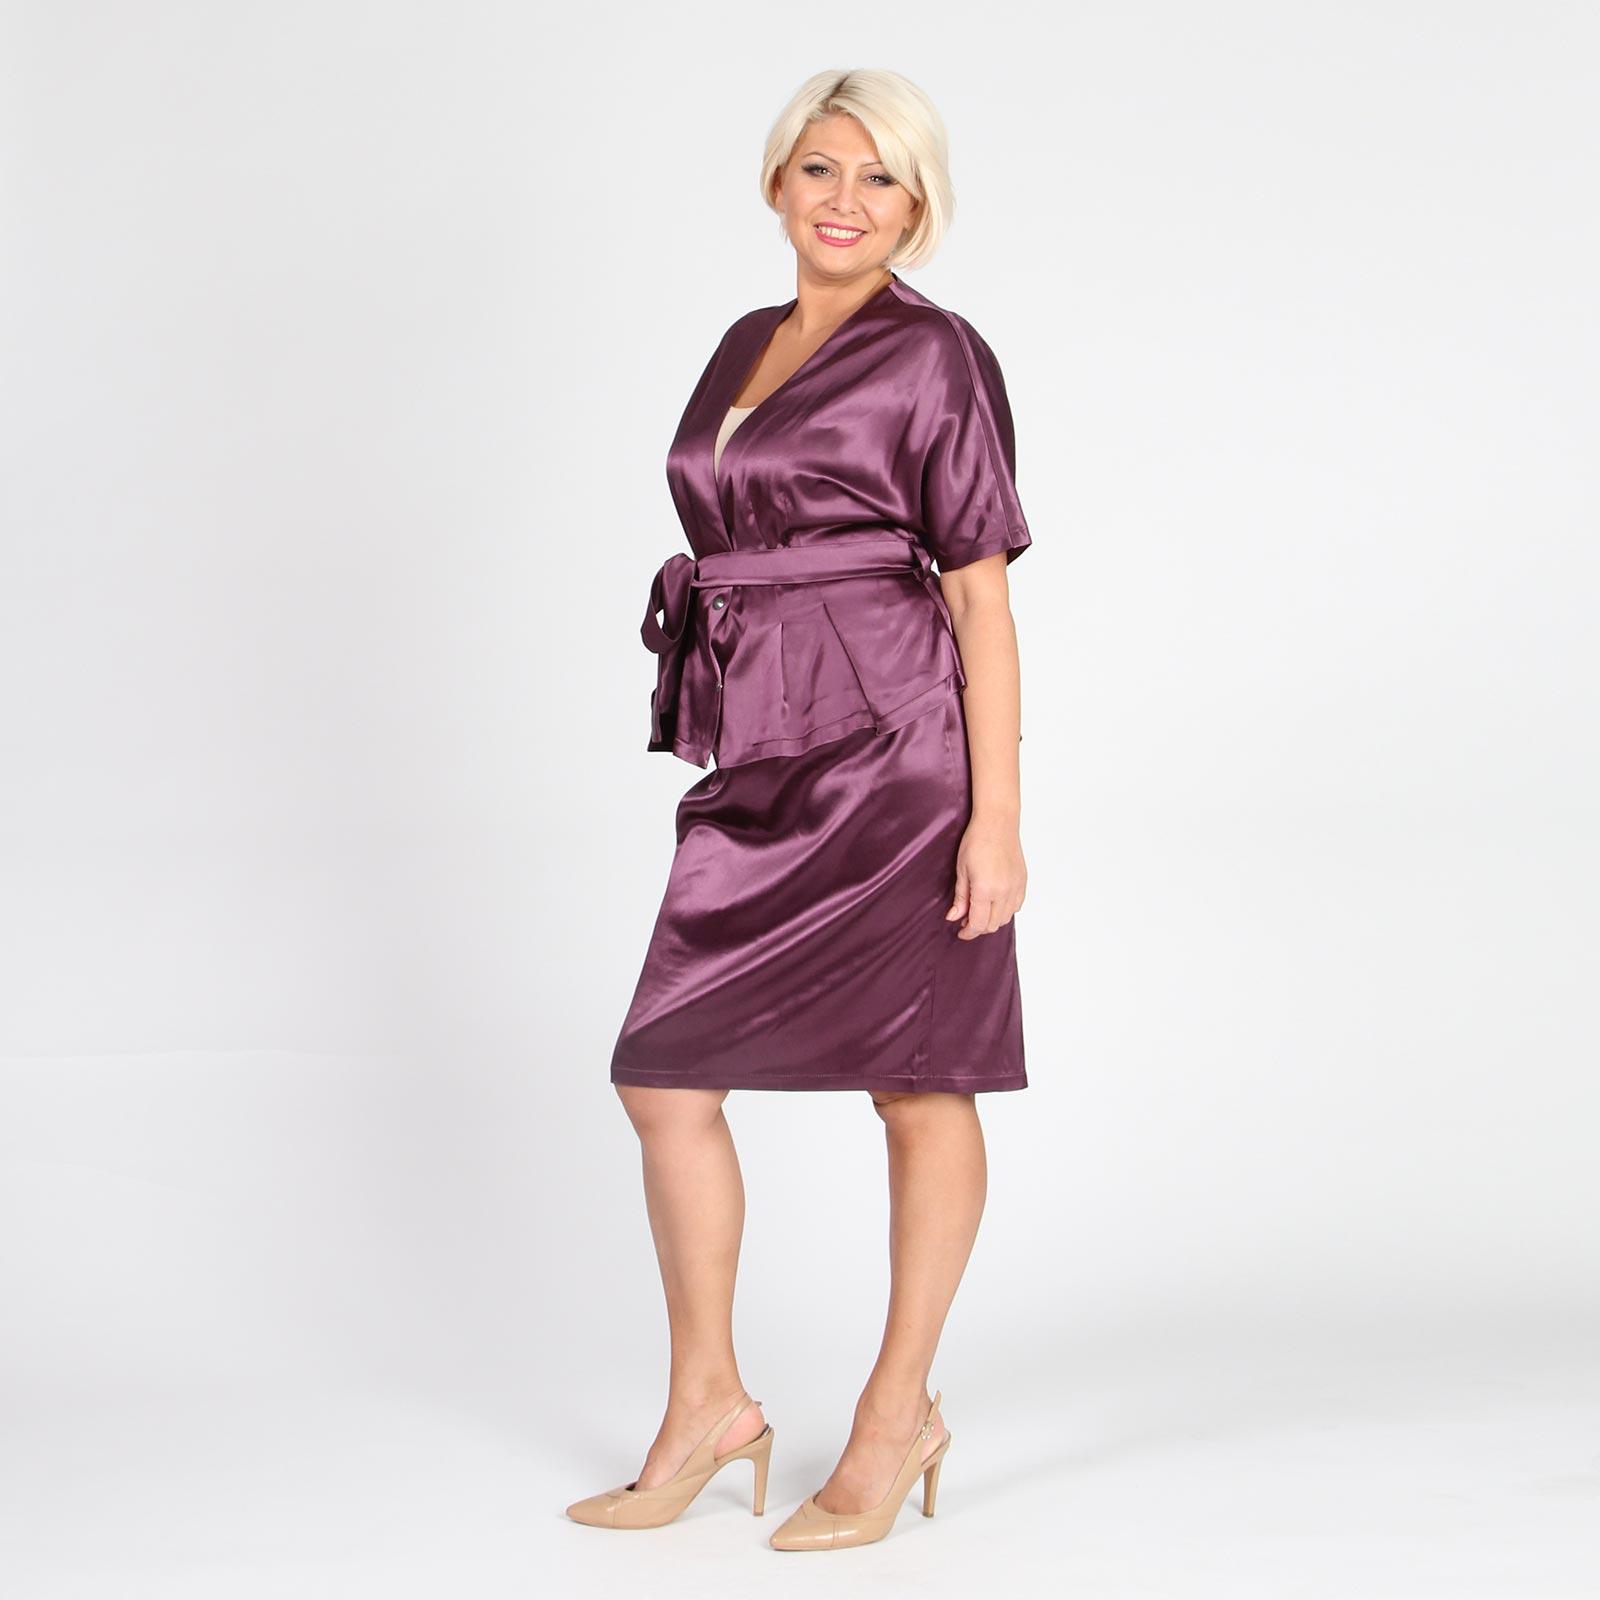 Атласная юбка доставка